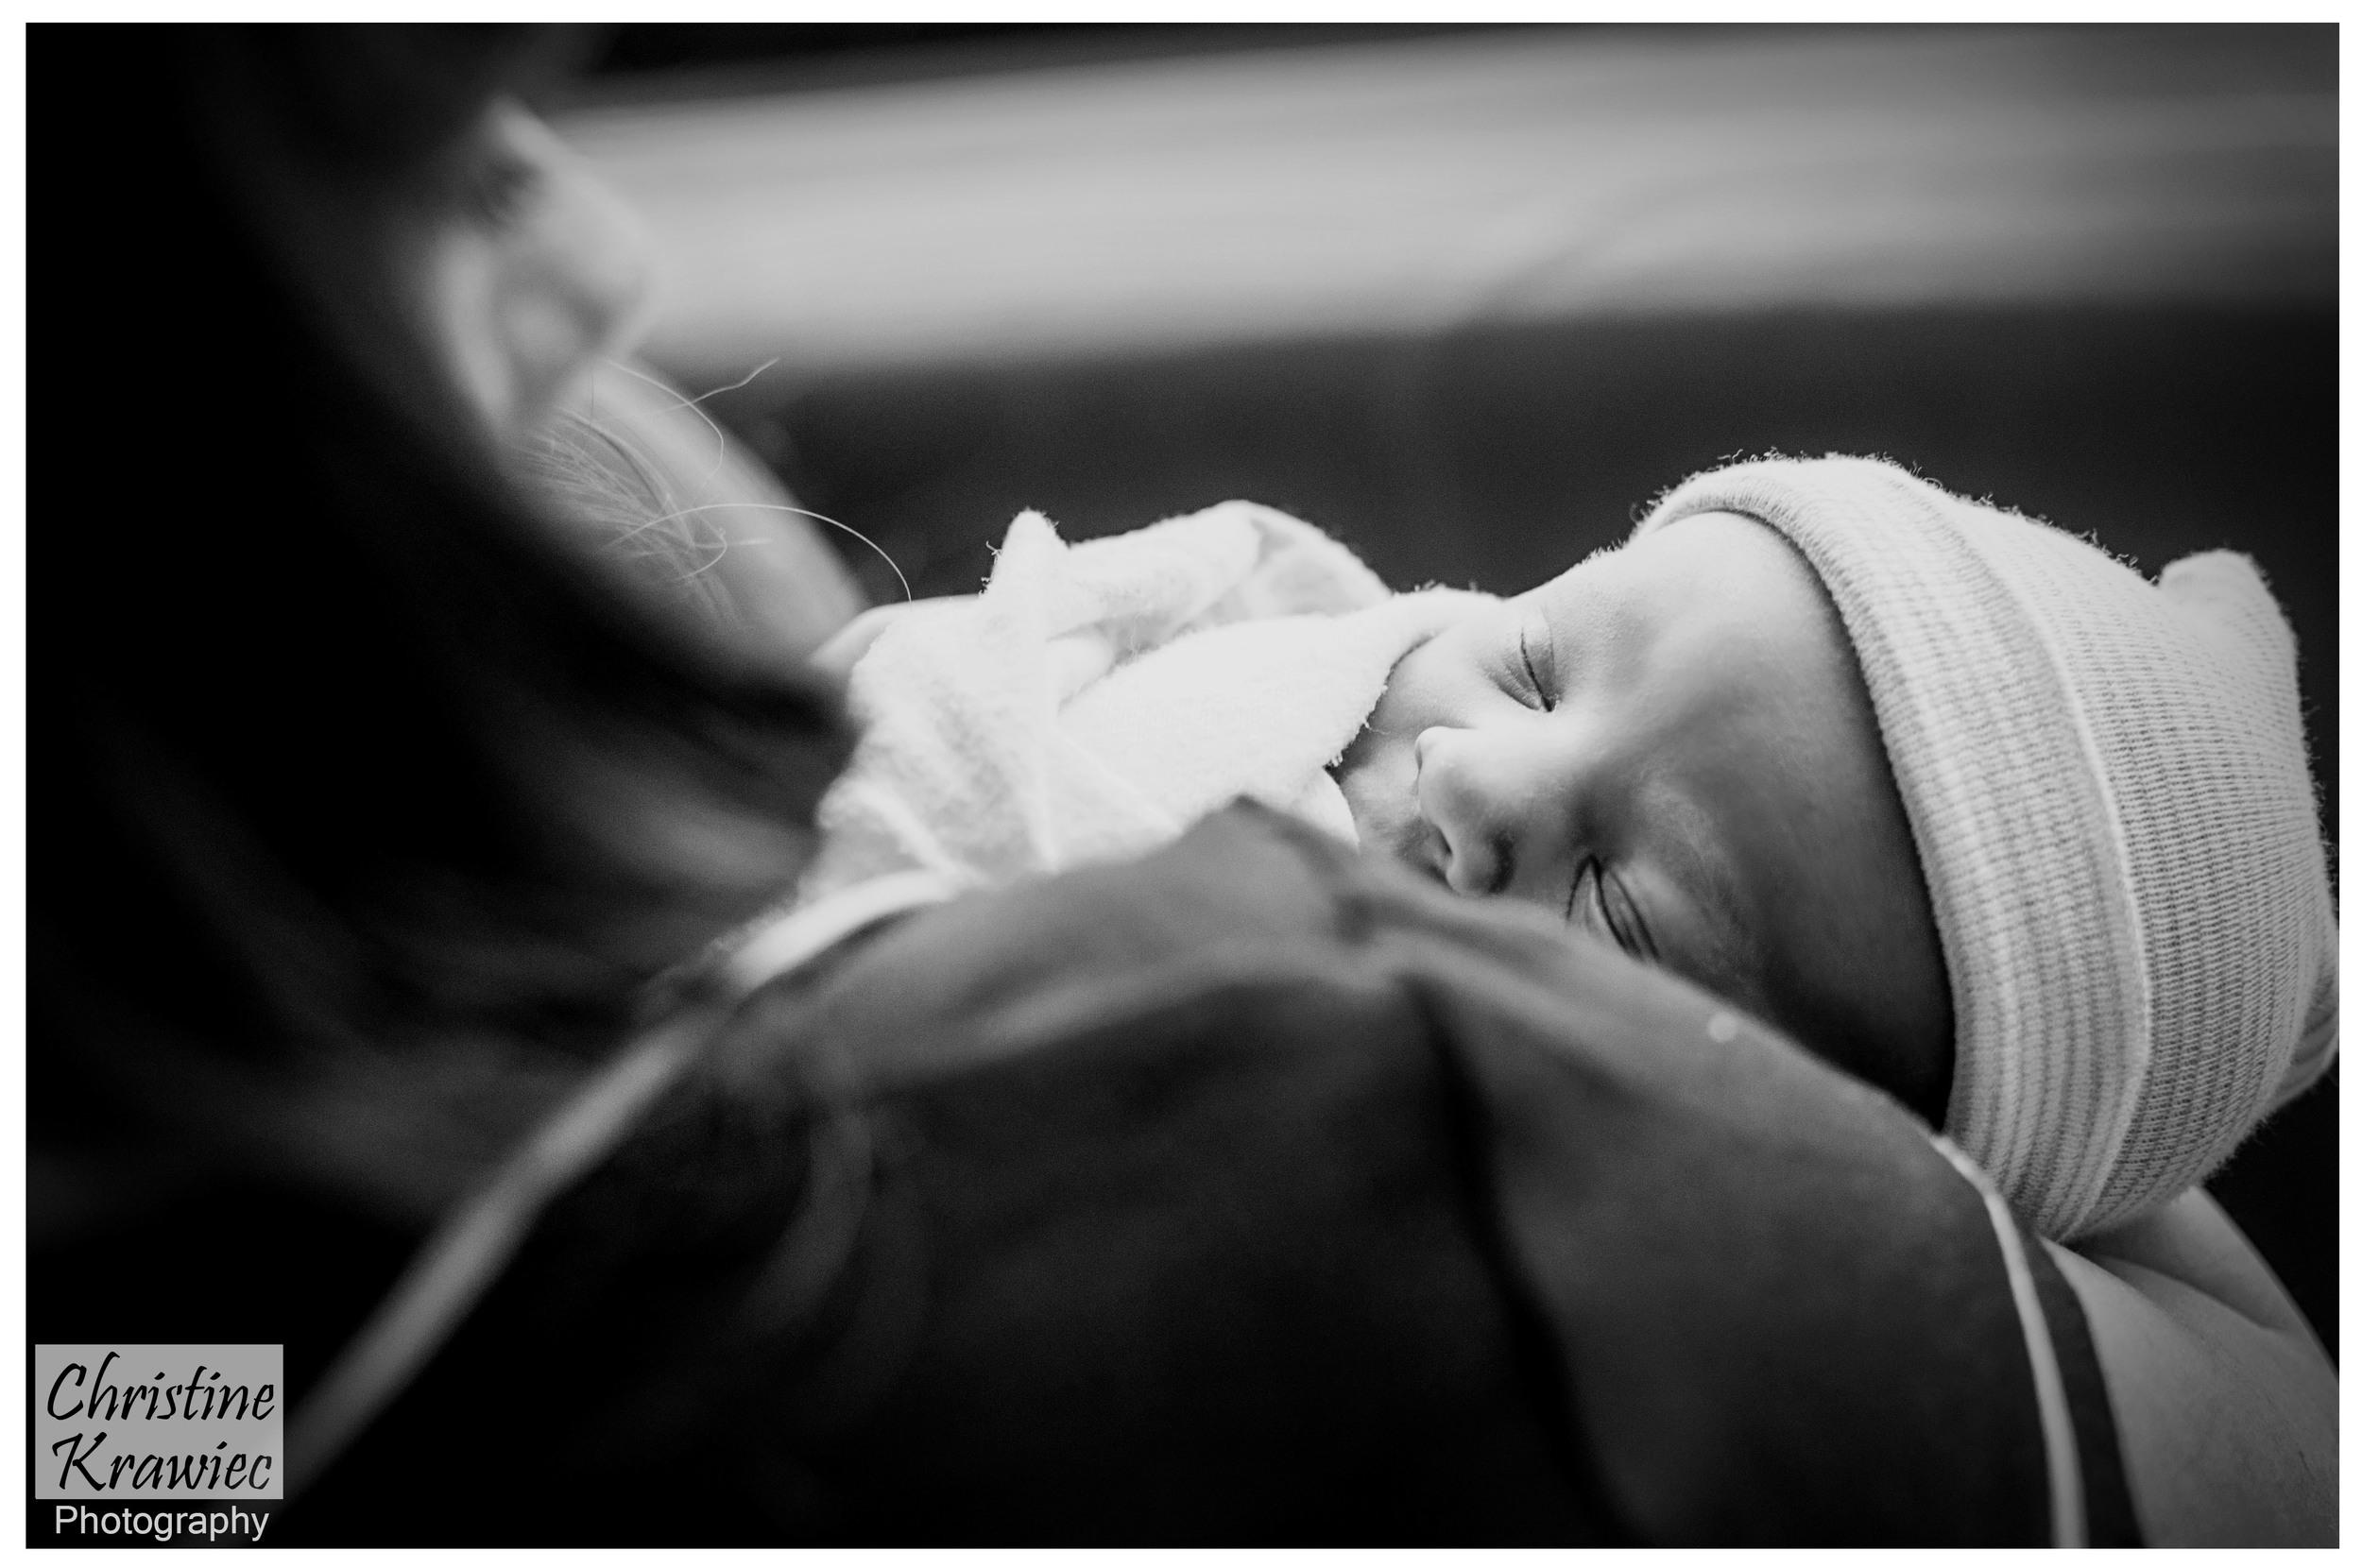 Christine Krawiec Photography - South Jersey Newborn Photographer